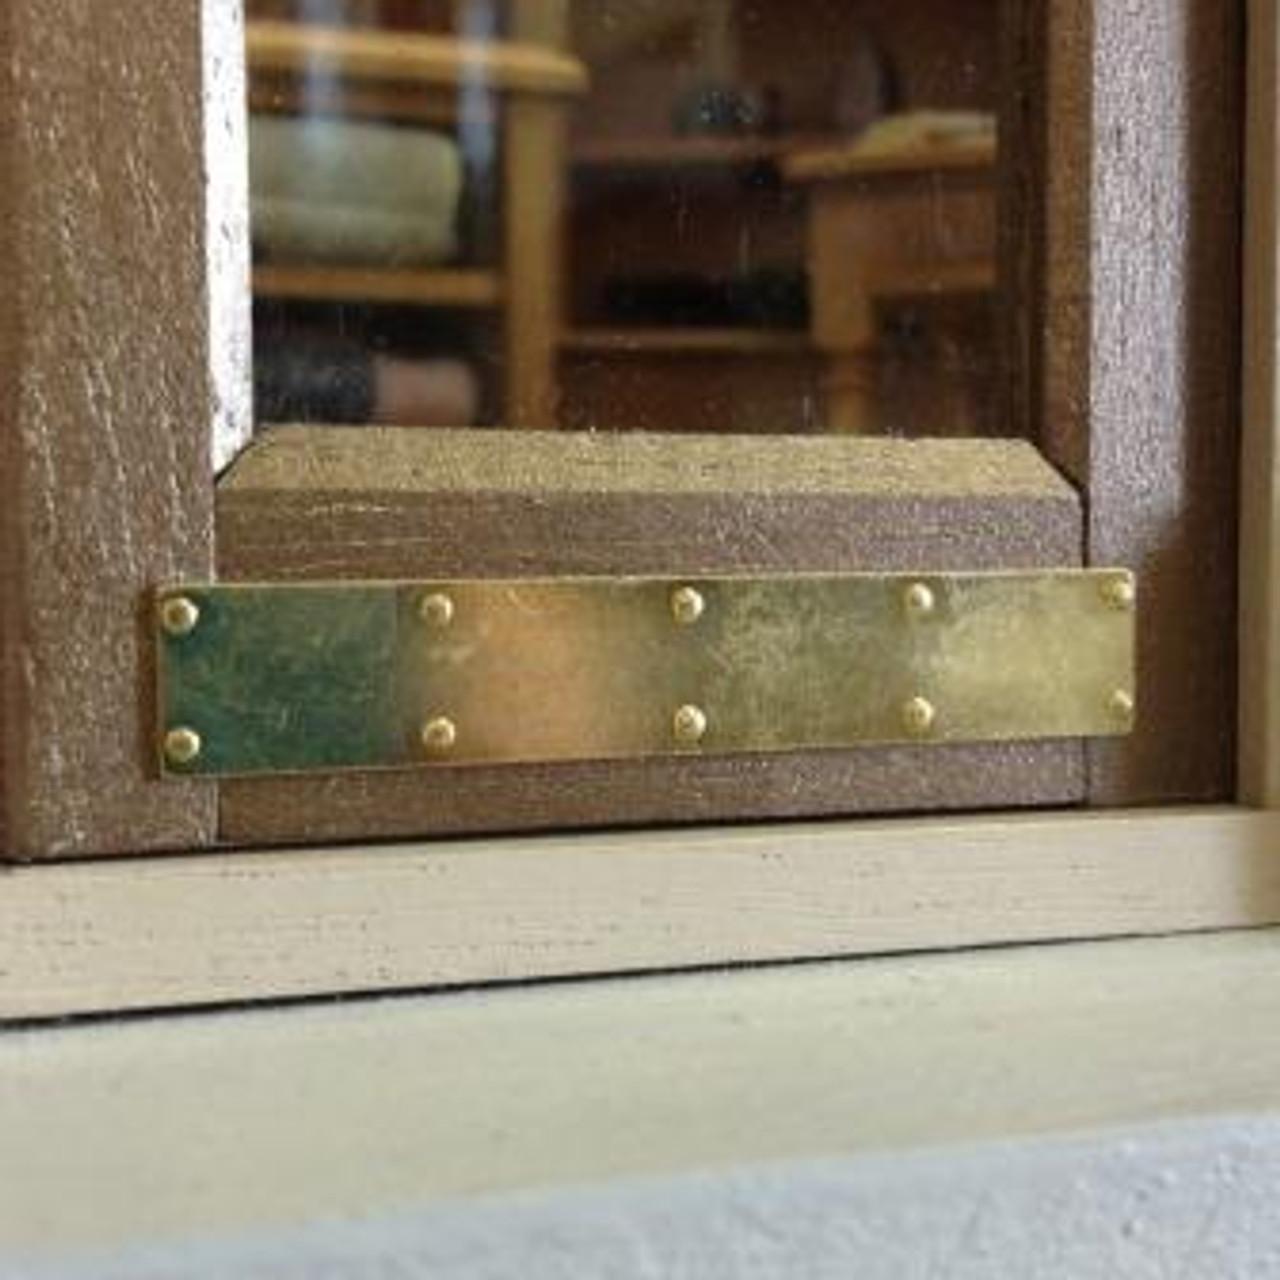 Brass kick plate shown installed on a miniature door.